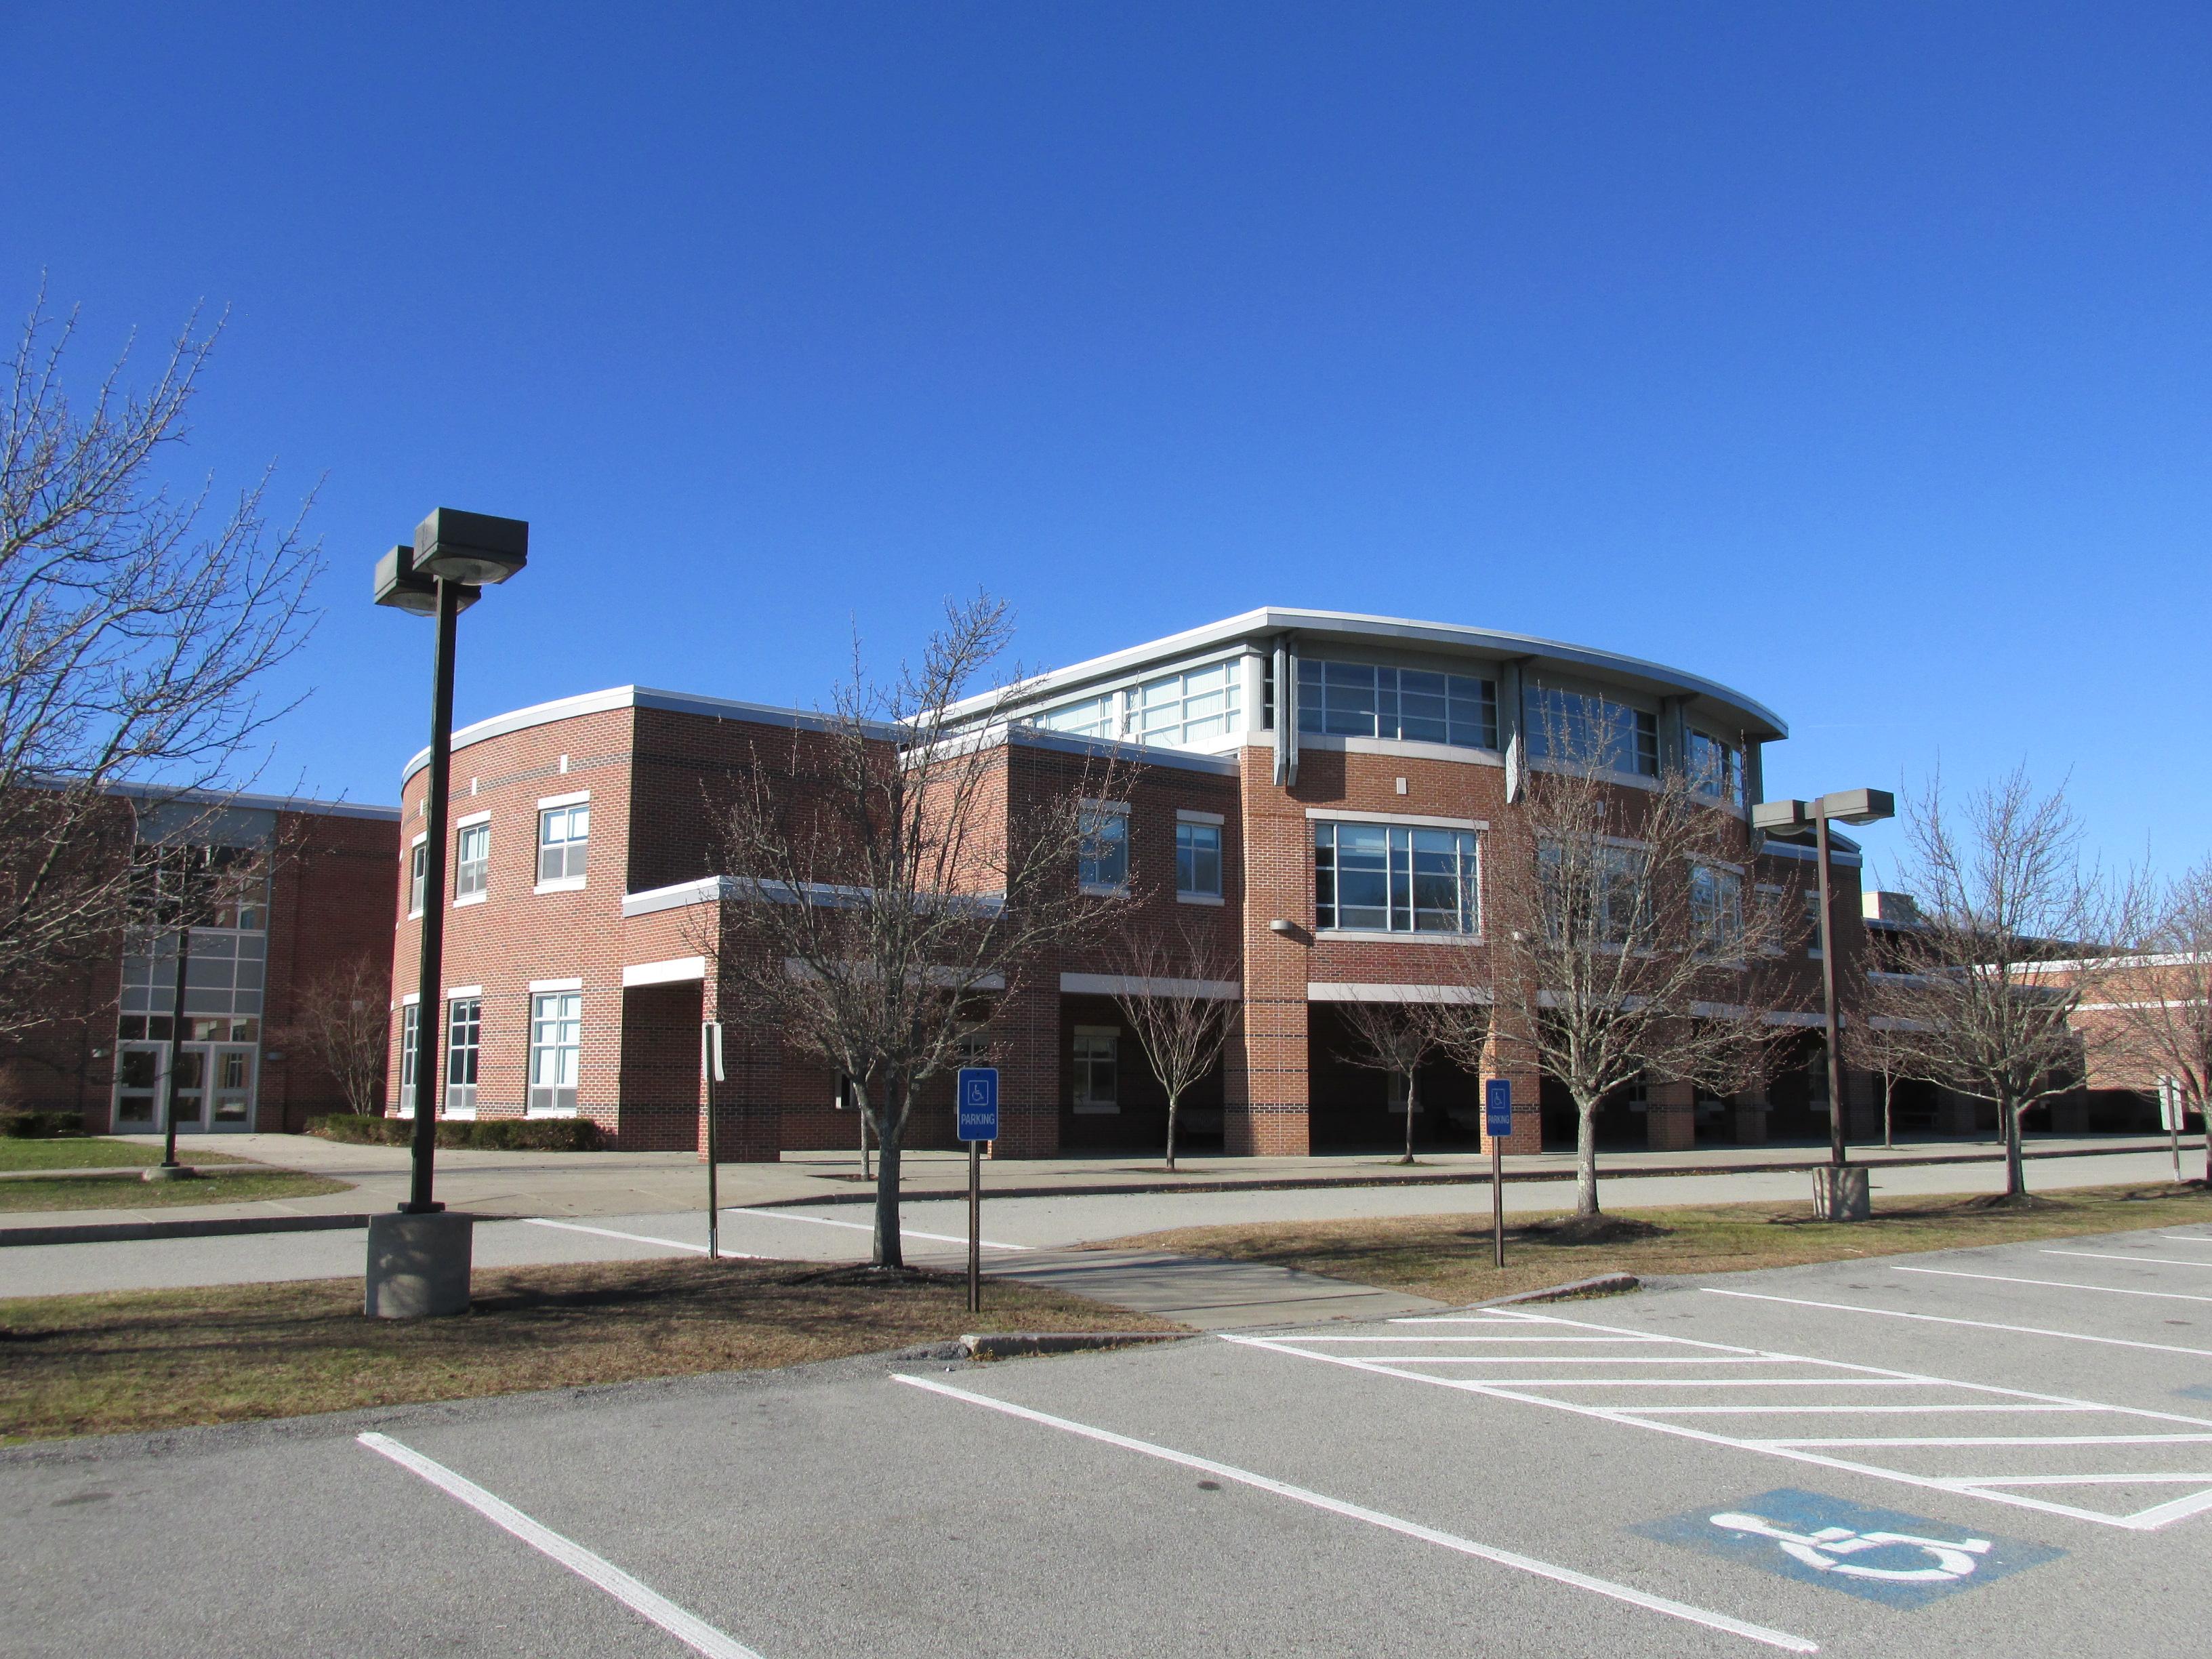 File:Hingham High School, Hingham MA.jpg